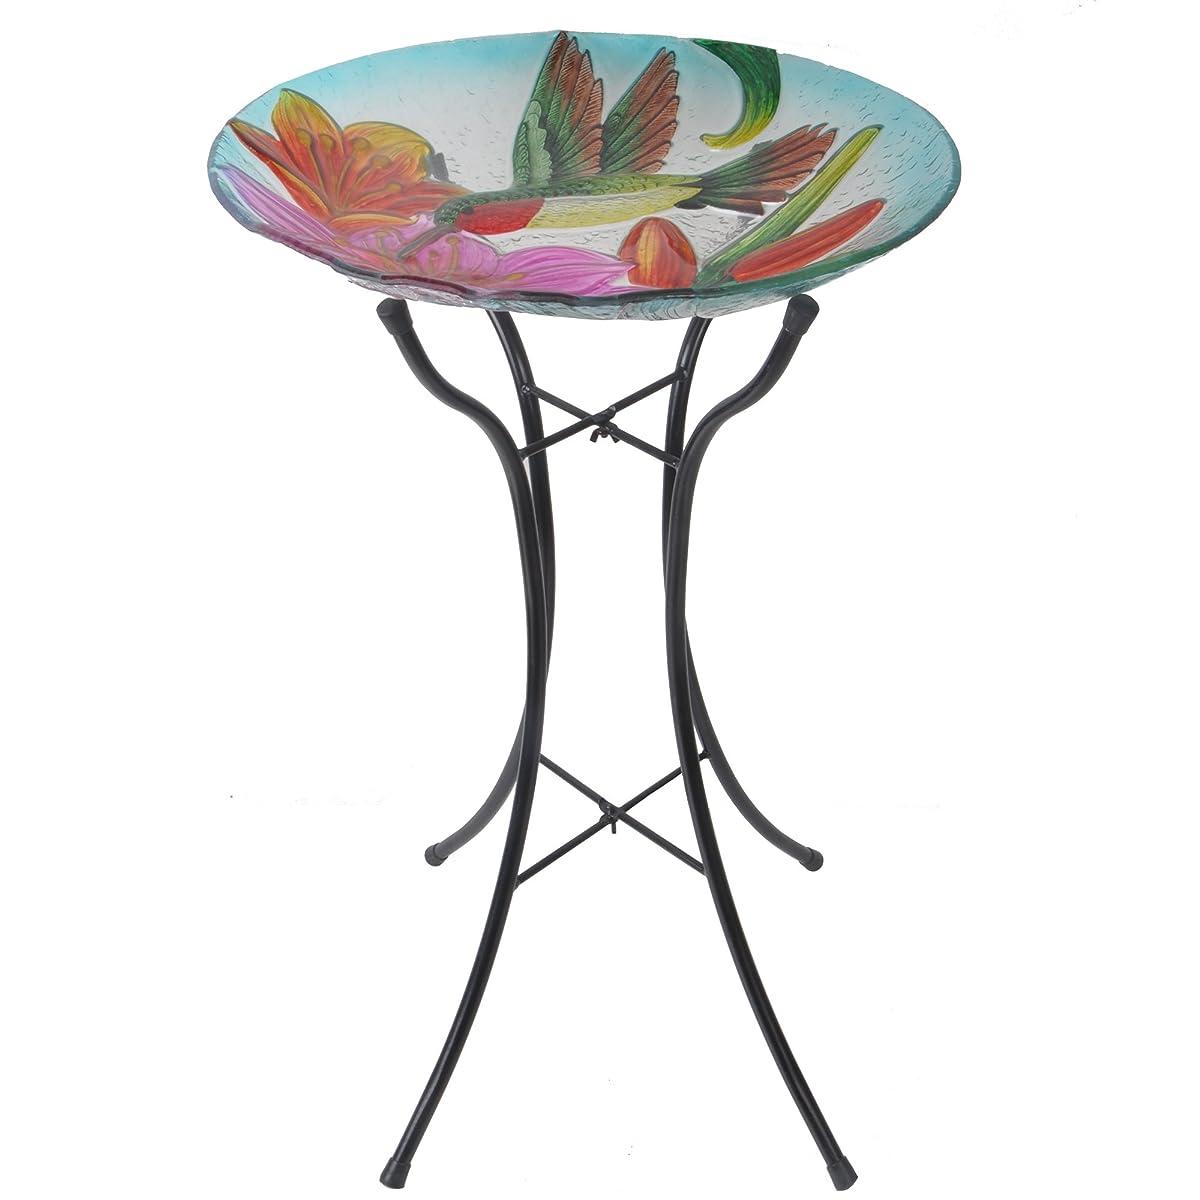 Peaktop Outdoor 18-Inch Hummingbird Fusion Glass Bird Bath w/Metal Stand - Pink and Green